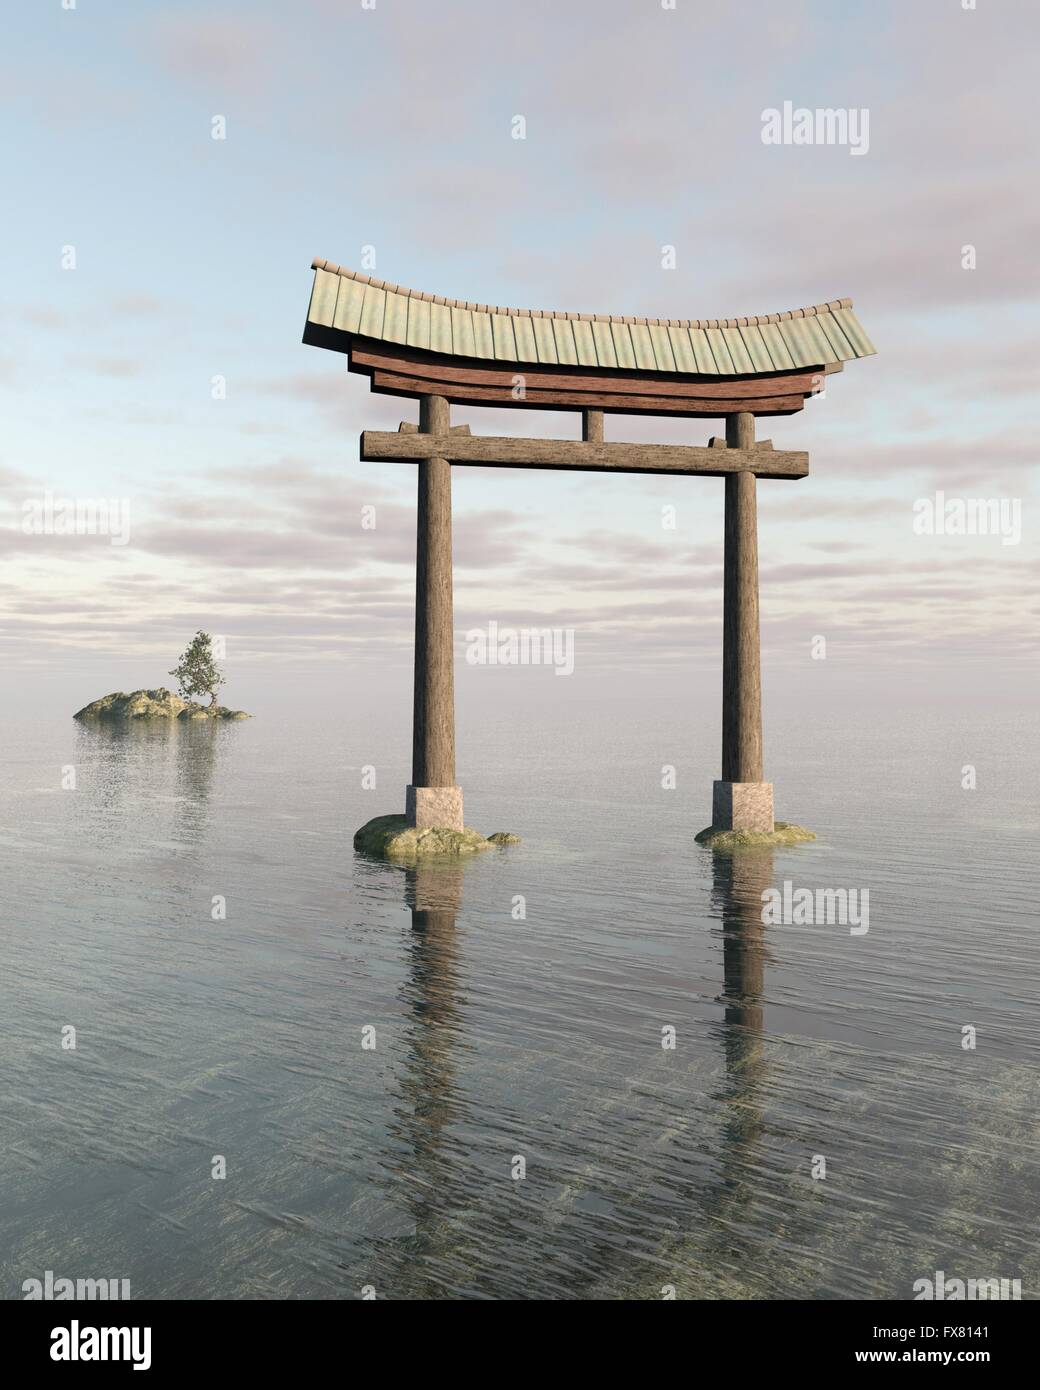 Japanese Floating Torii Gate at a Shinto Shrine - Stock Image